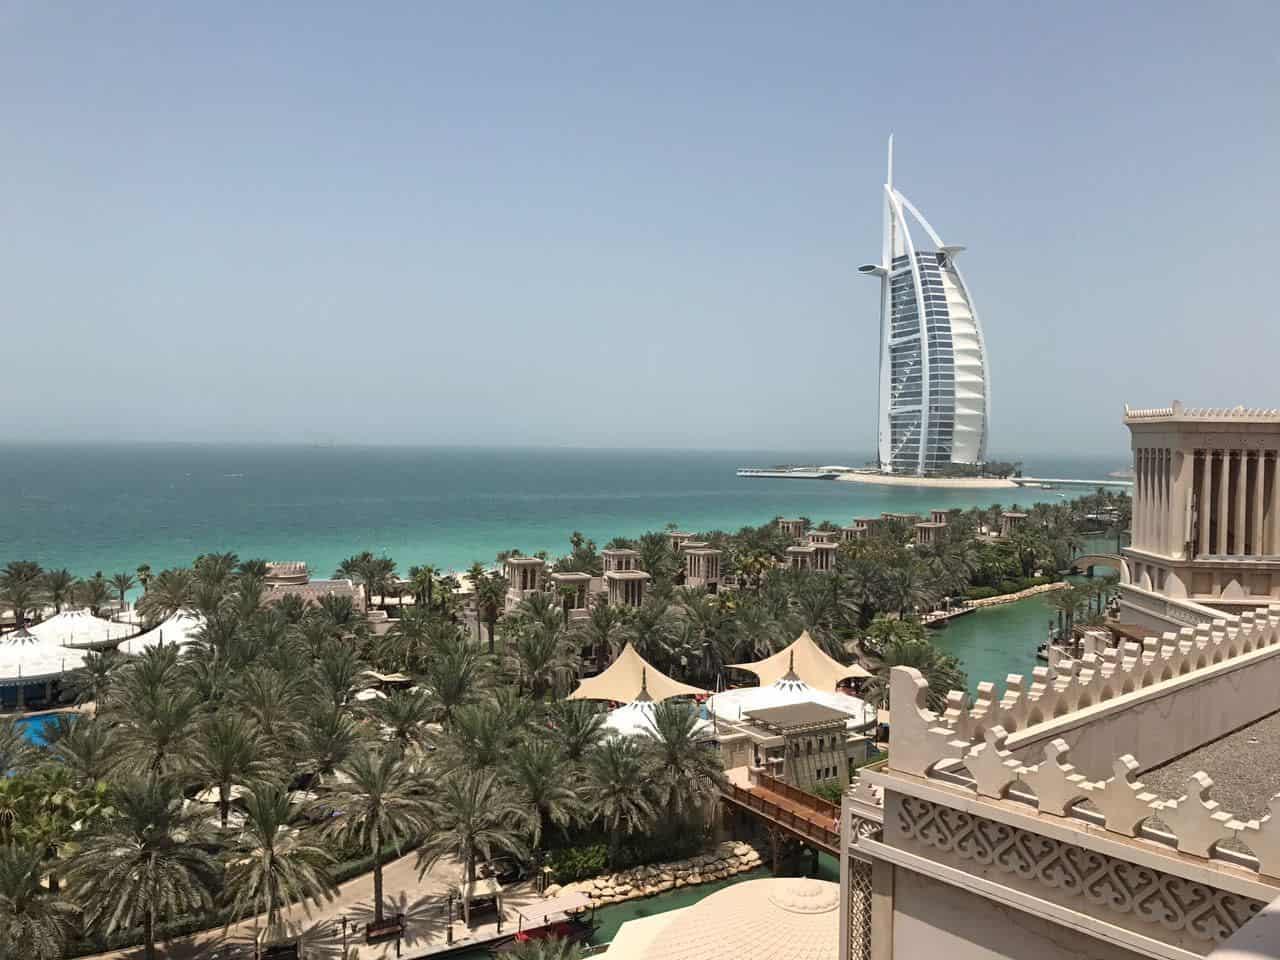 EWTC Inforeise Jumeirah Al Naseem Highlight Hotel